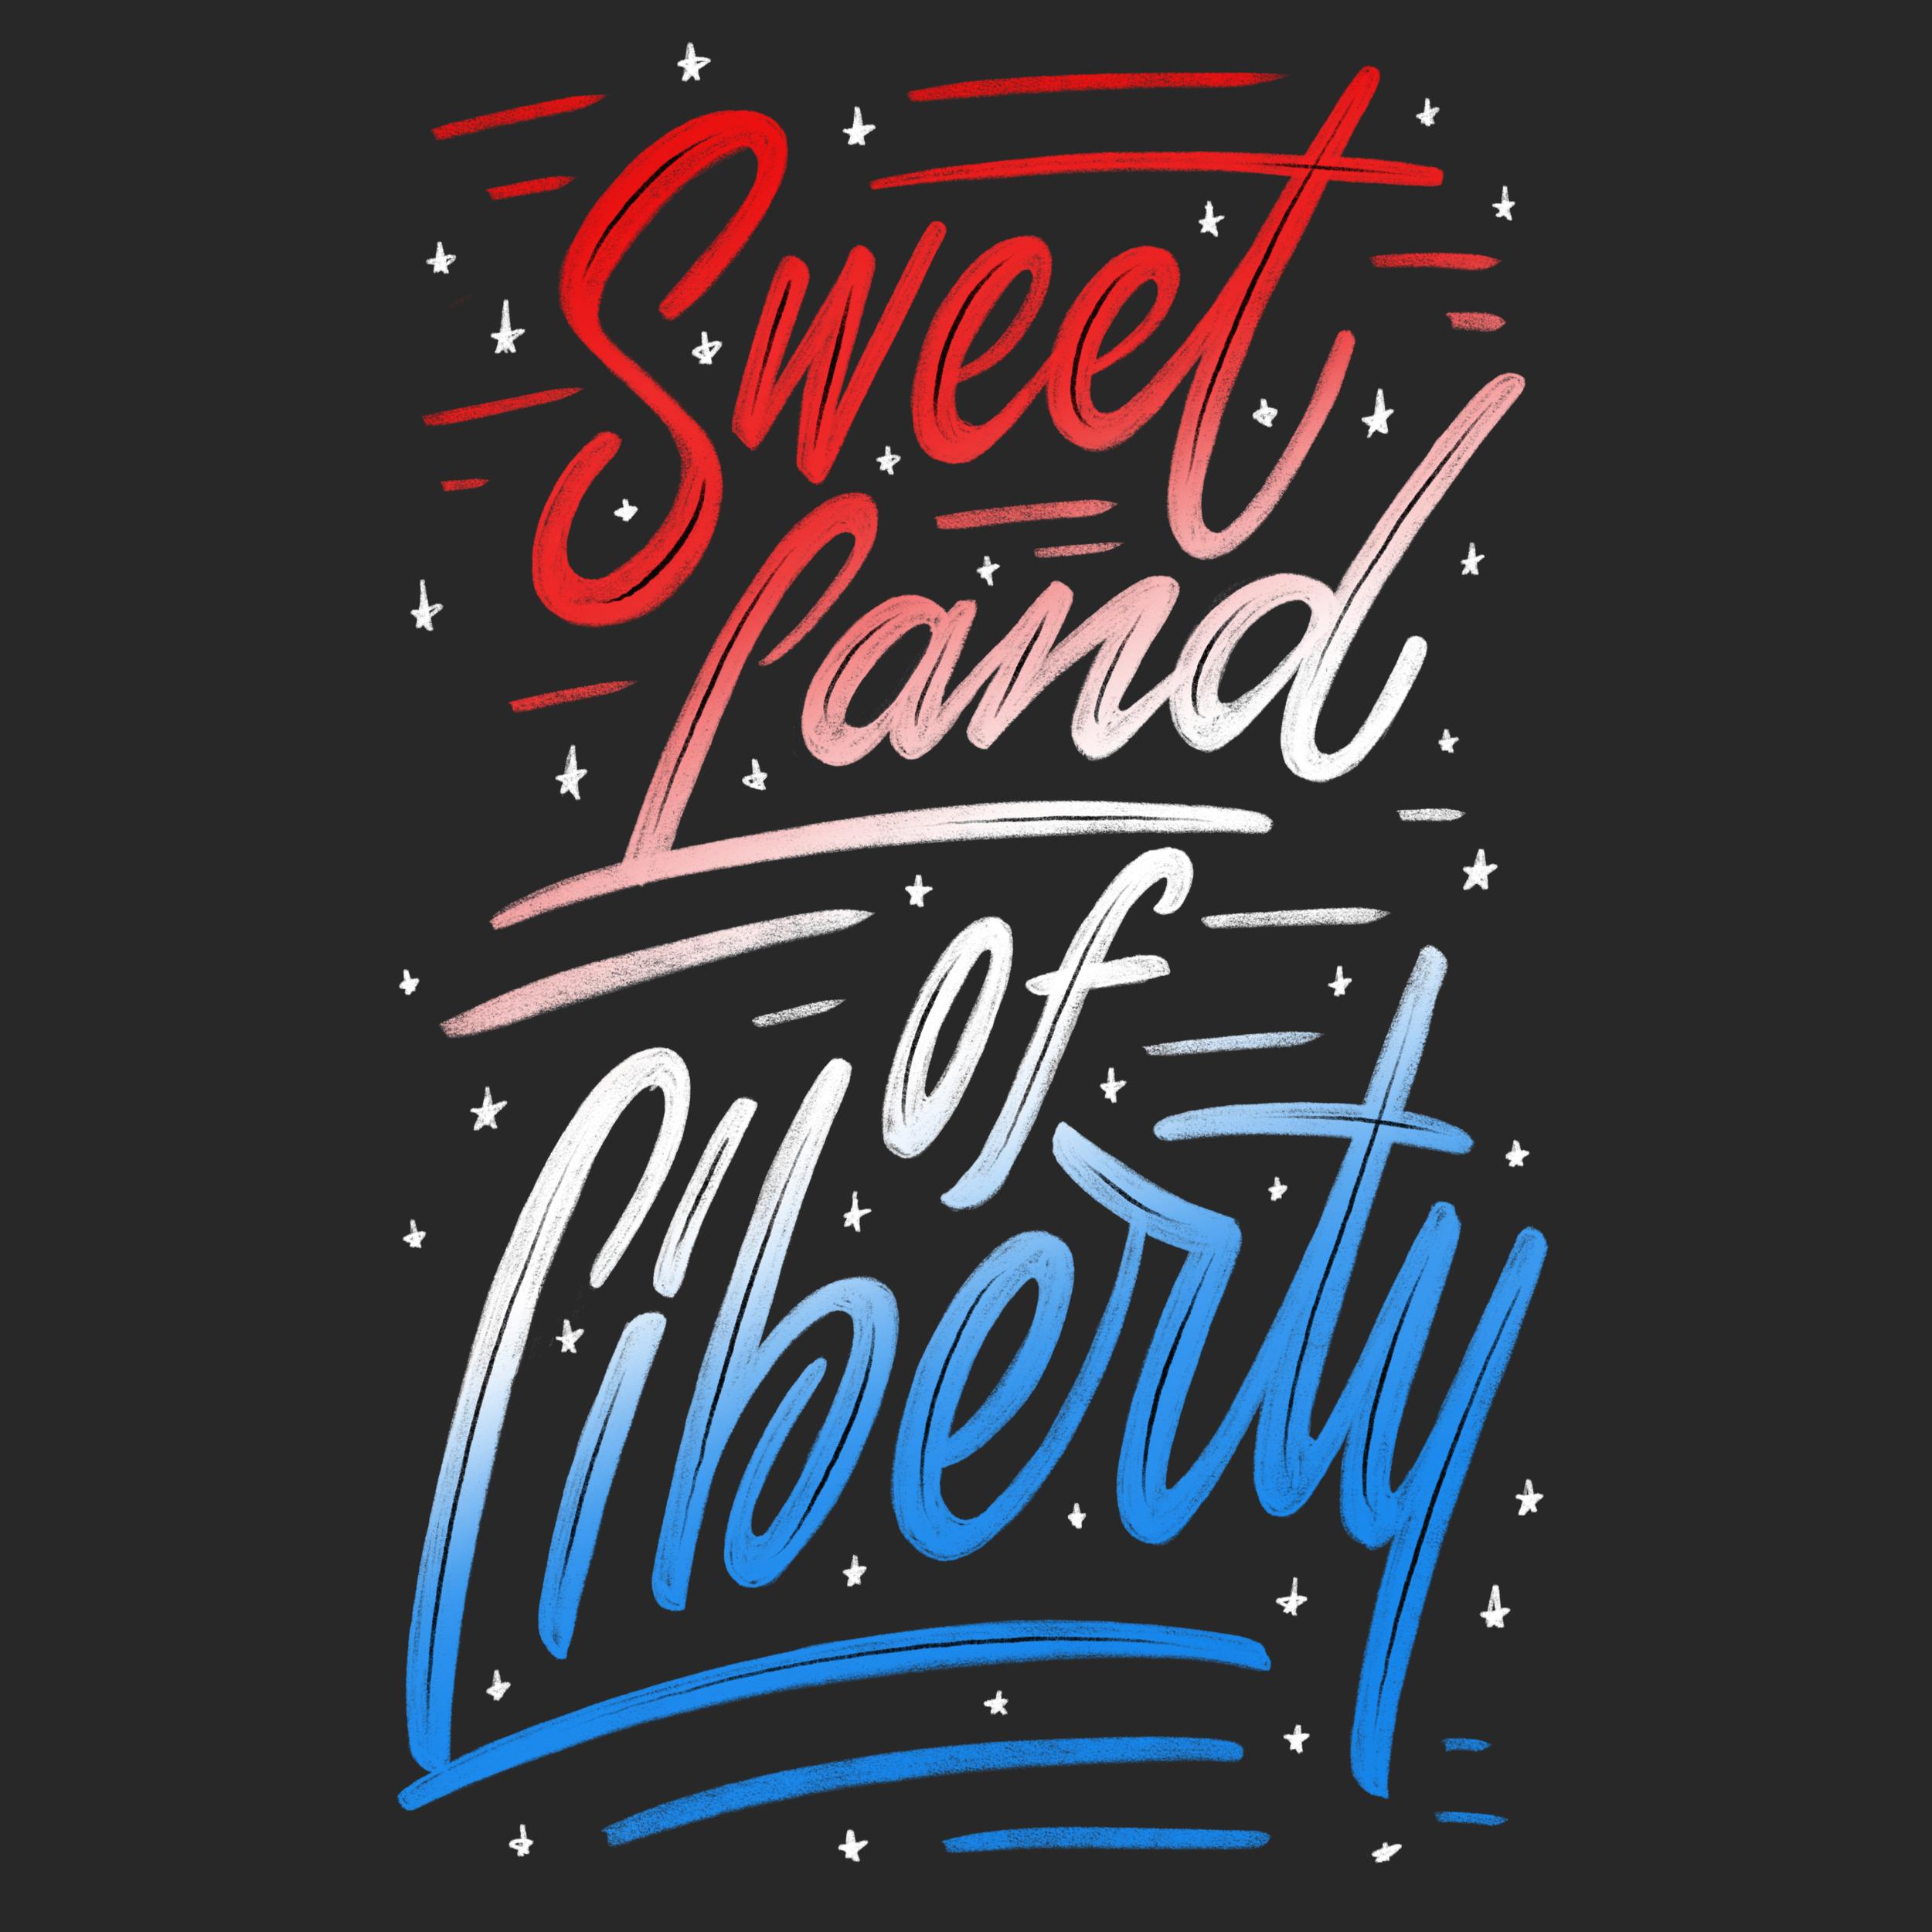 sweet_land_of_liberty_procreate copy.png